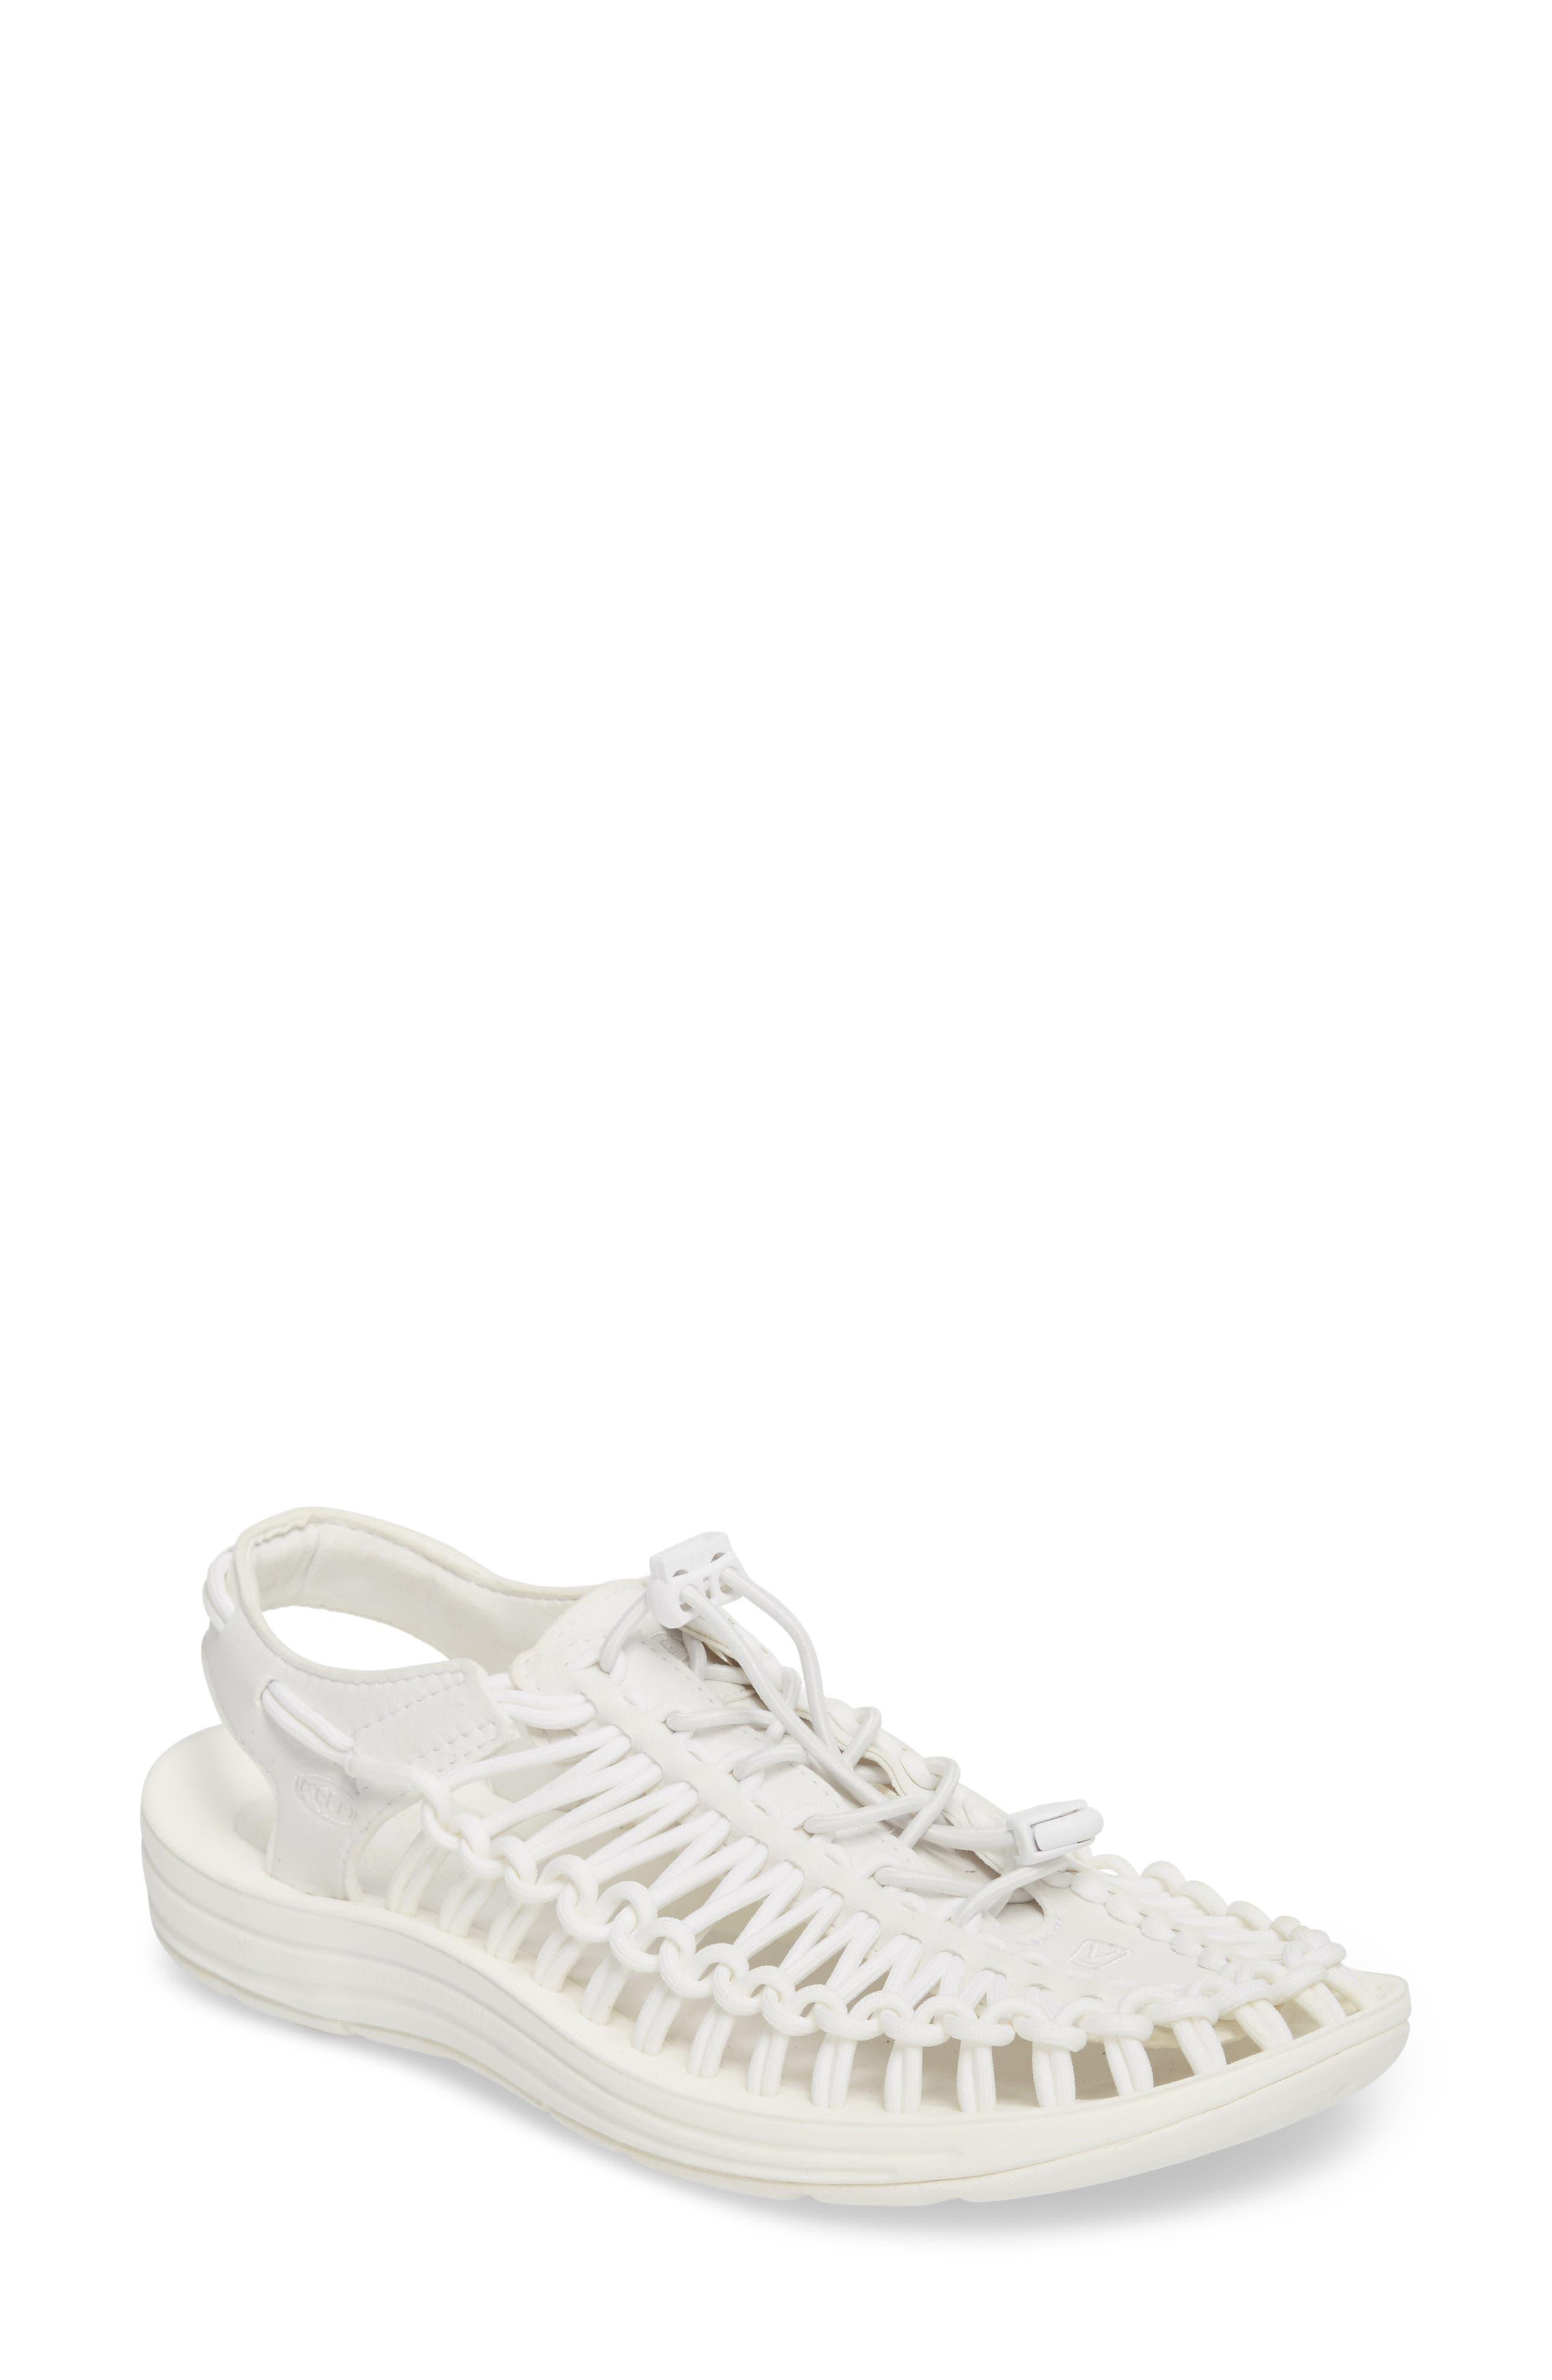 'Uneek' Water Sneaker,                             Main thumbnail 1, color,                             Star White